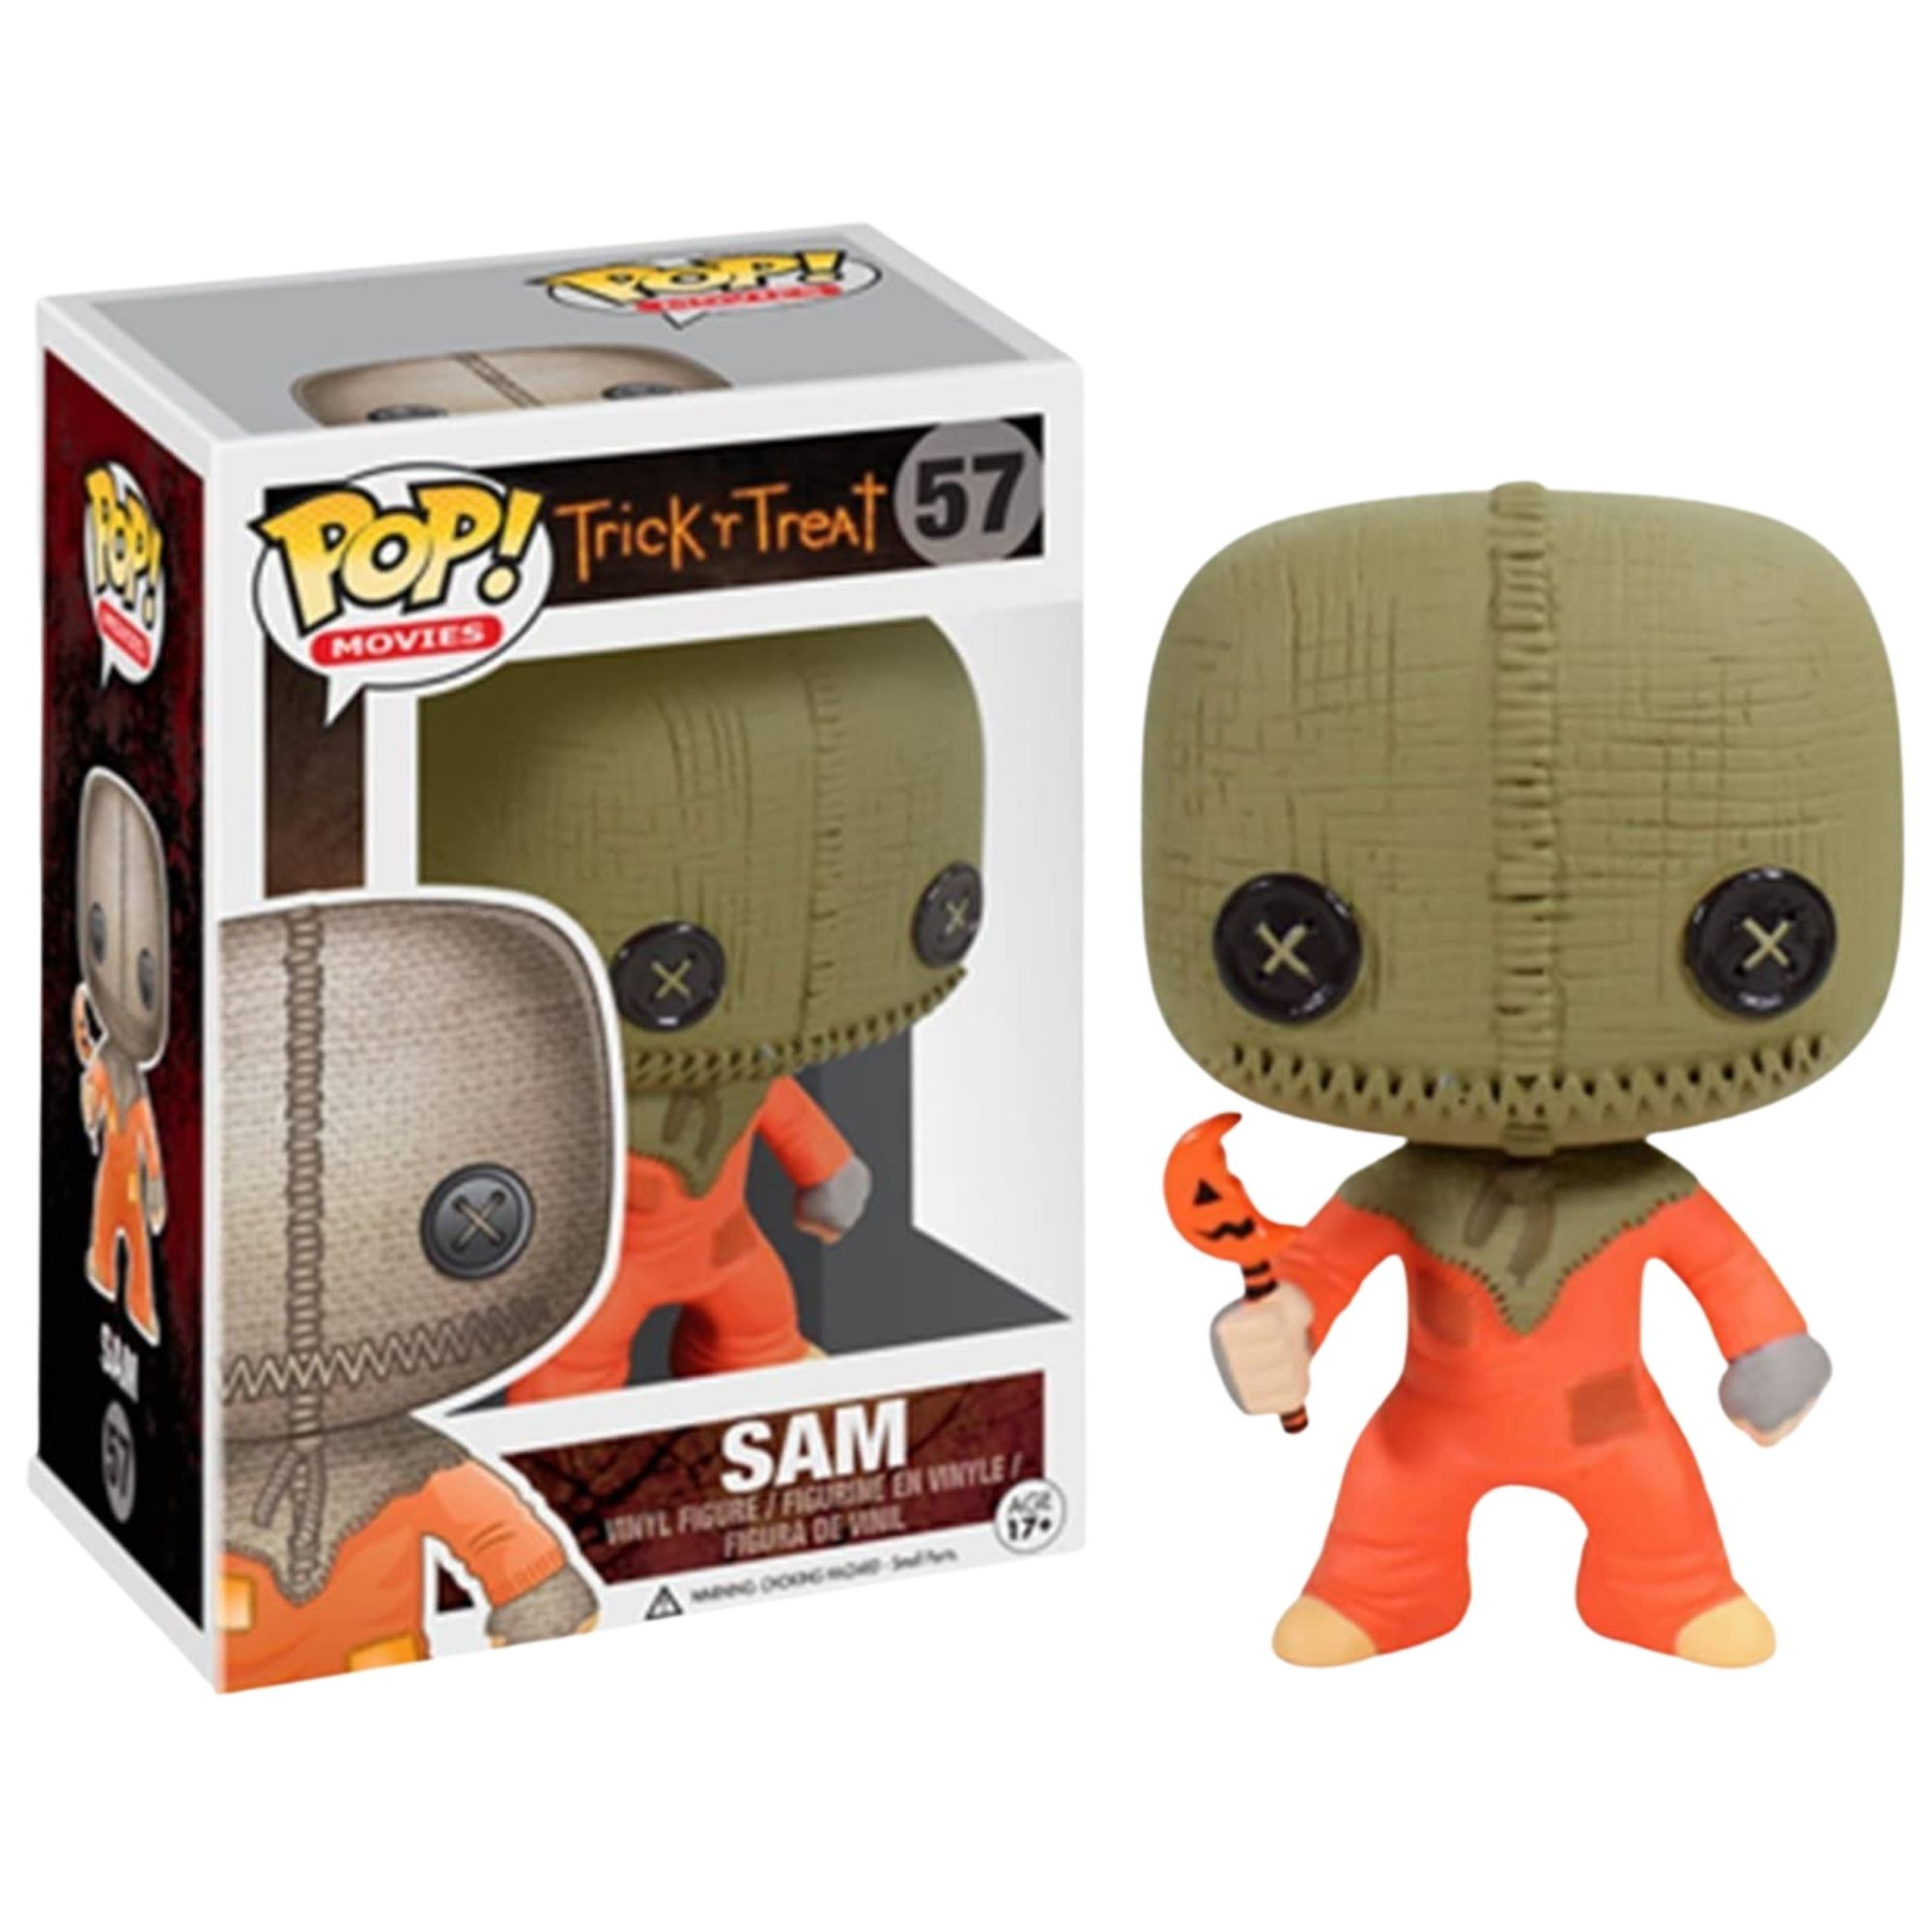 Funko Pop Trick r Treat Sam #57  - Game Land Brinquedos